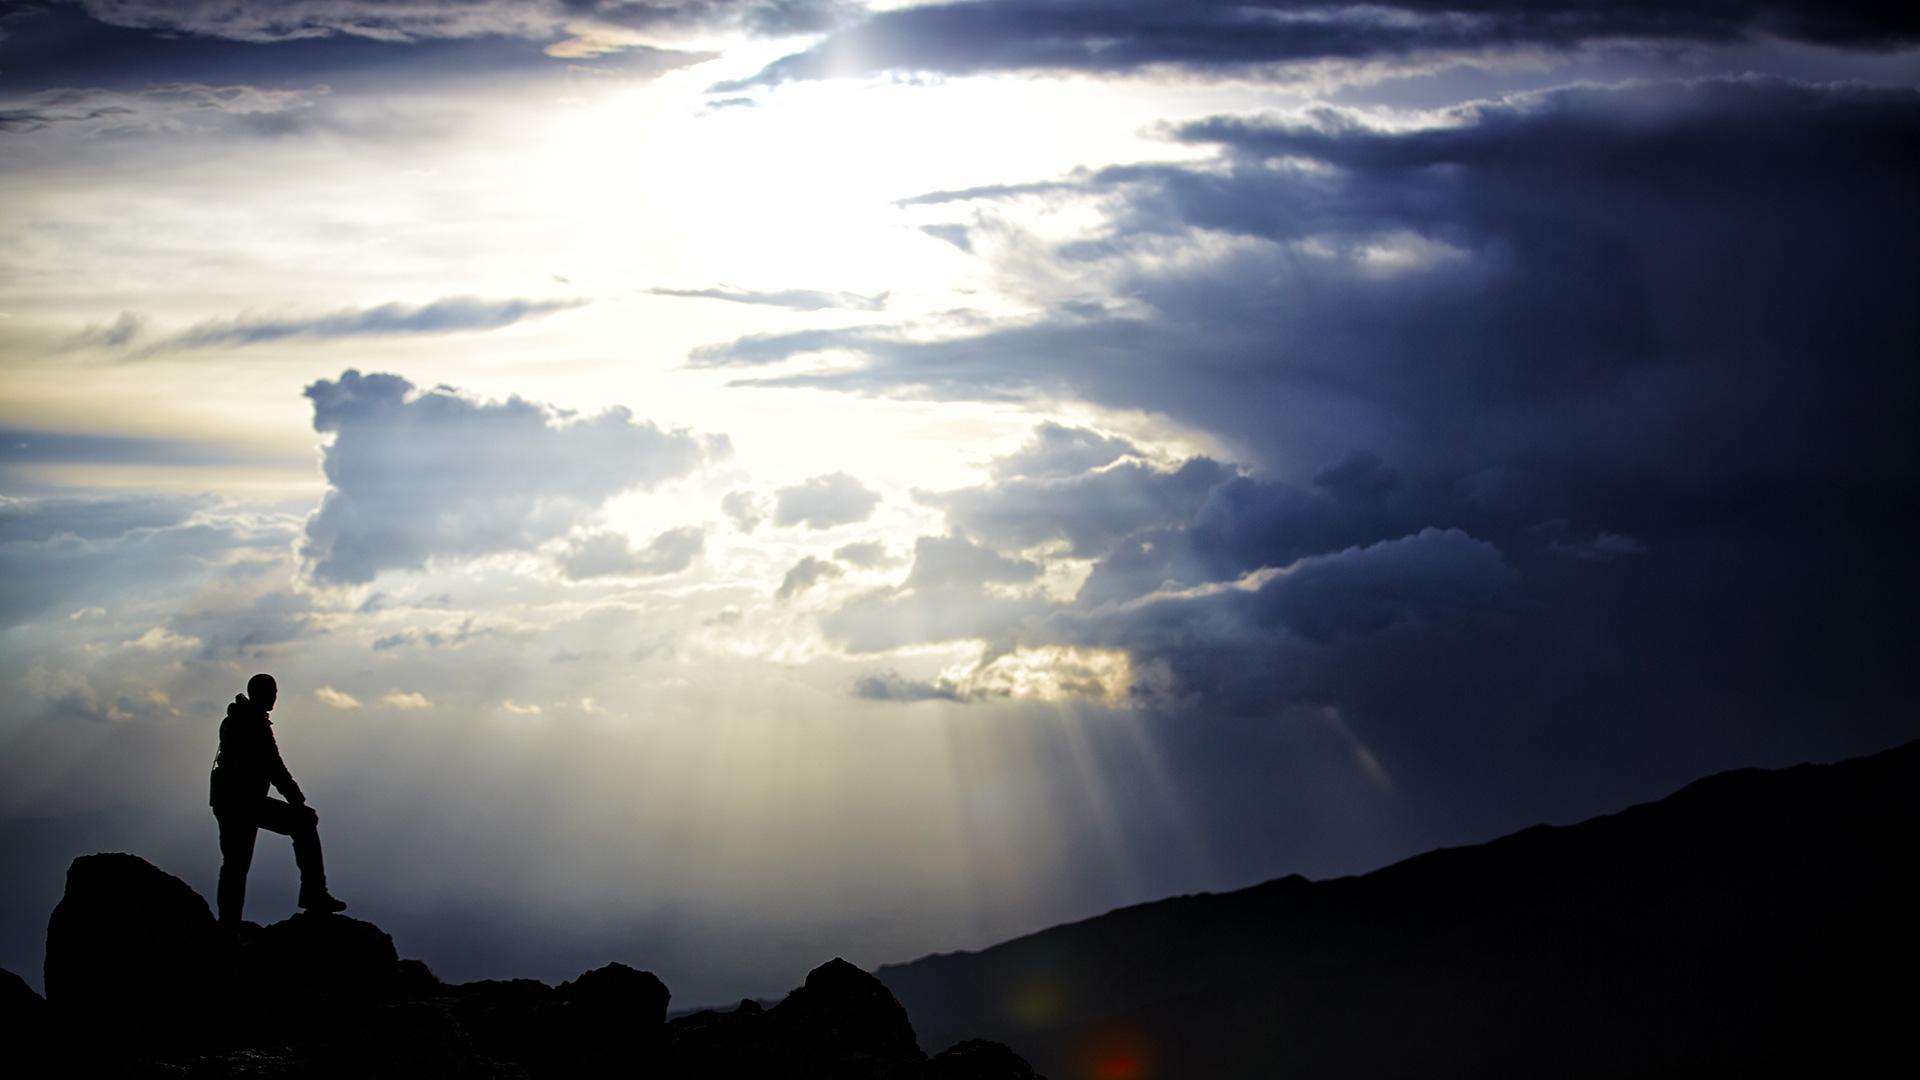 PDJPhoto, Peter de Jong, Sluisweg 59, 2225 XJ, Katwijk, 2014, The Netherlands, Photographer, Climbing, Sevensummits, 7Summits, Travel, Photography, Apexcaptures, Landscape, Travelsome, Outdoors, Bestnatureshot, ourplanetdaily,thephotographersclub, Awsomemearth, Worldshotz, Wow, Earthfocus, Thosetravelers, Way2ill, Mountains, Glacier, Ice, Snow, Winter, Wanderlust, NEVE, Kilimanjaro,Afrika, Mount Kilimanjaro, Moshi, Marchame, Pole pole,  People, Summitday, Tanzania, Rainforest